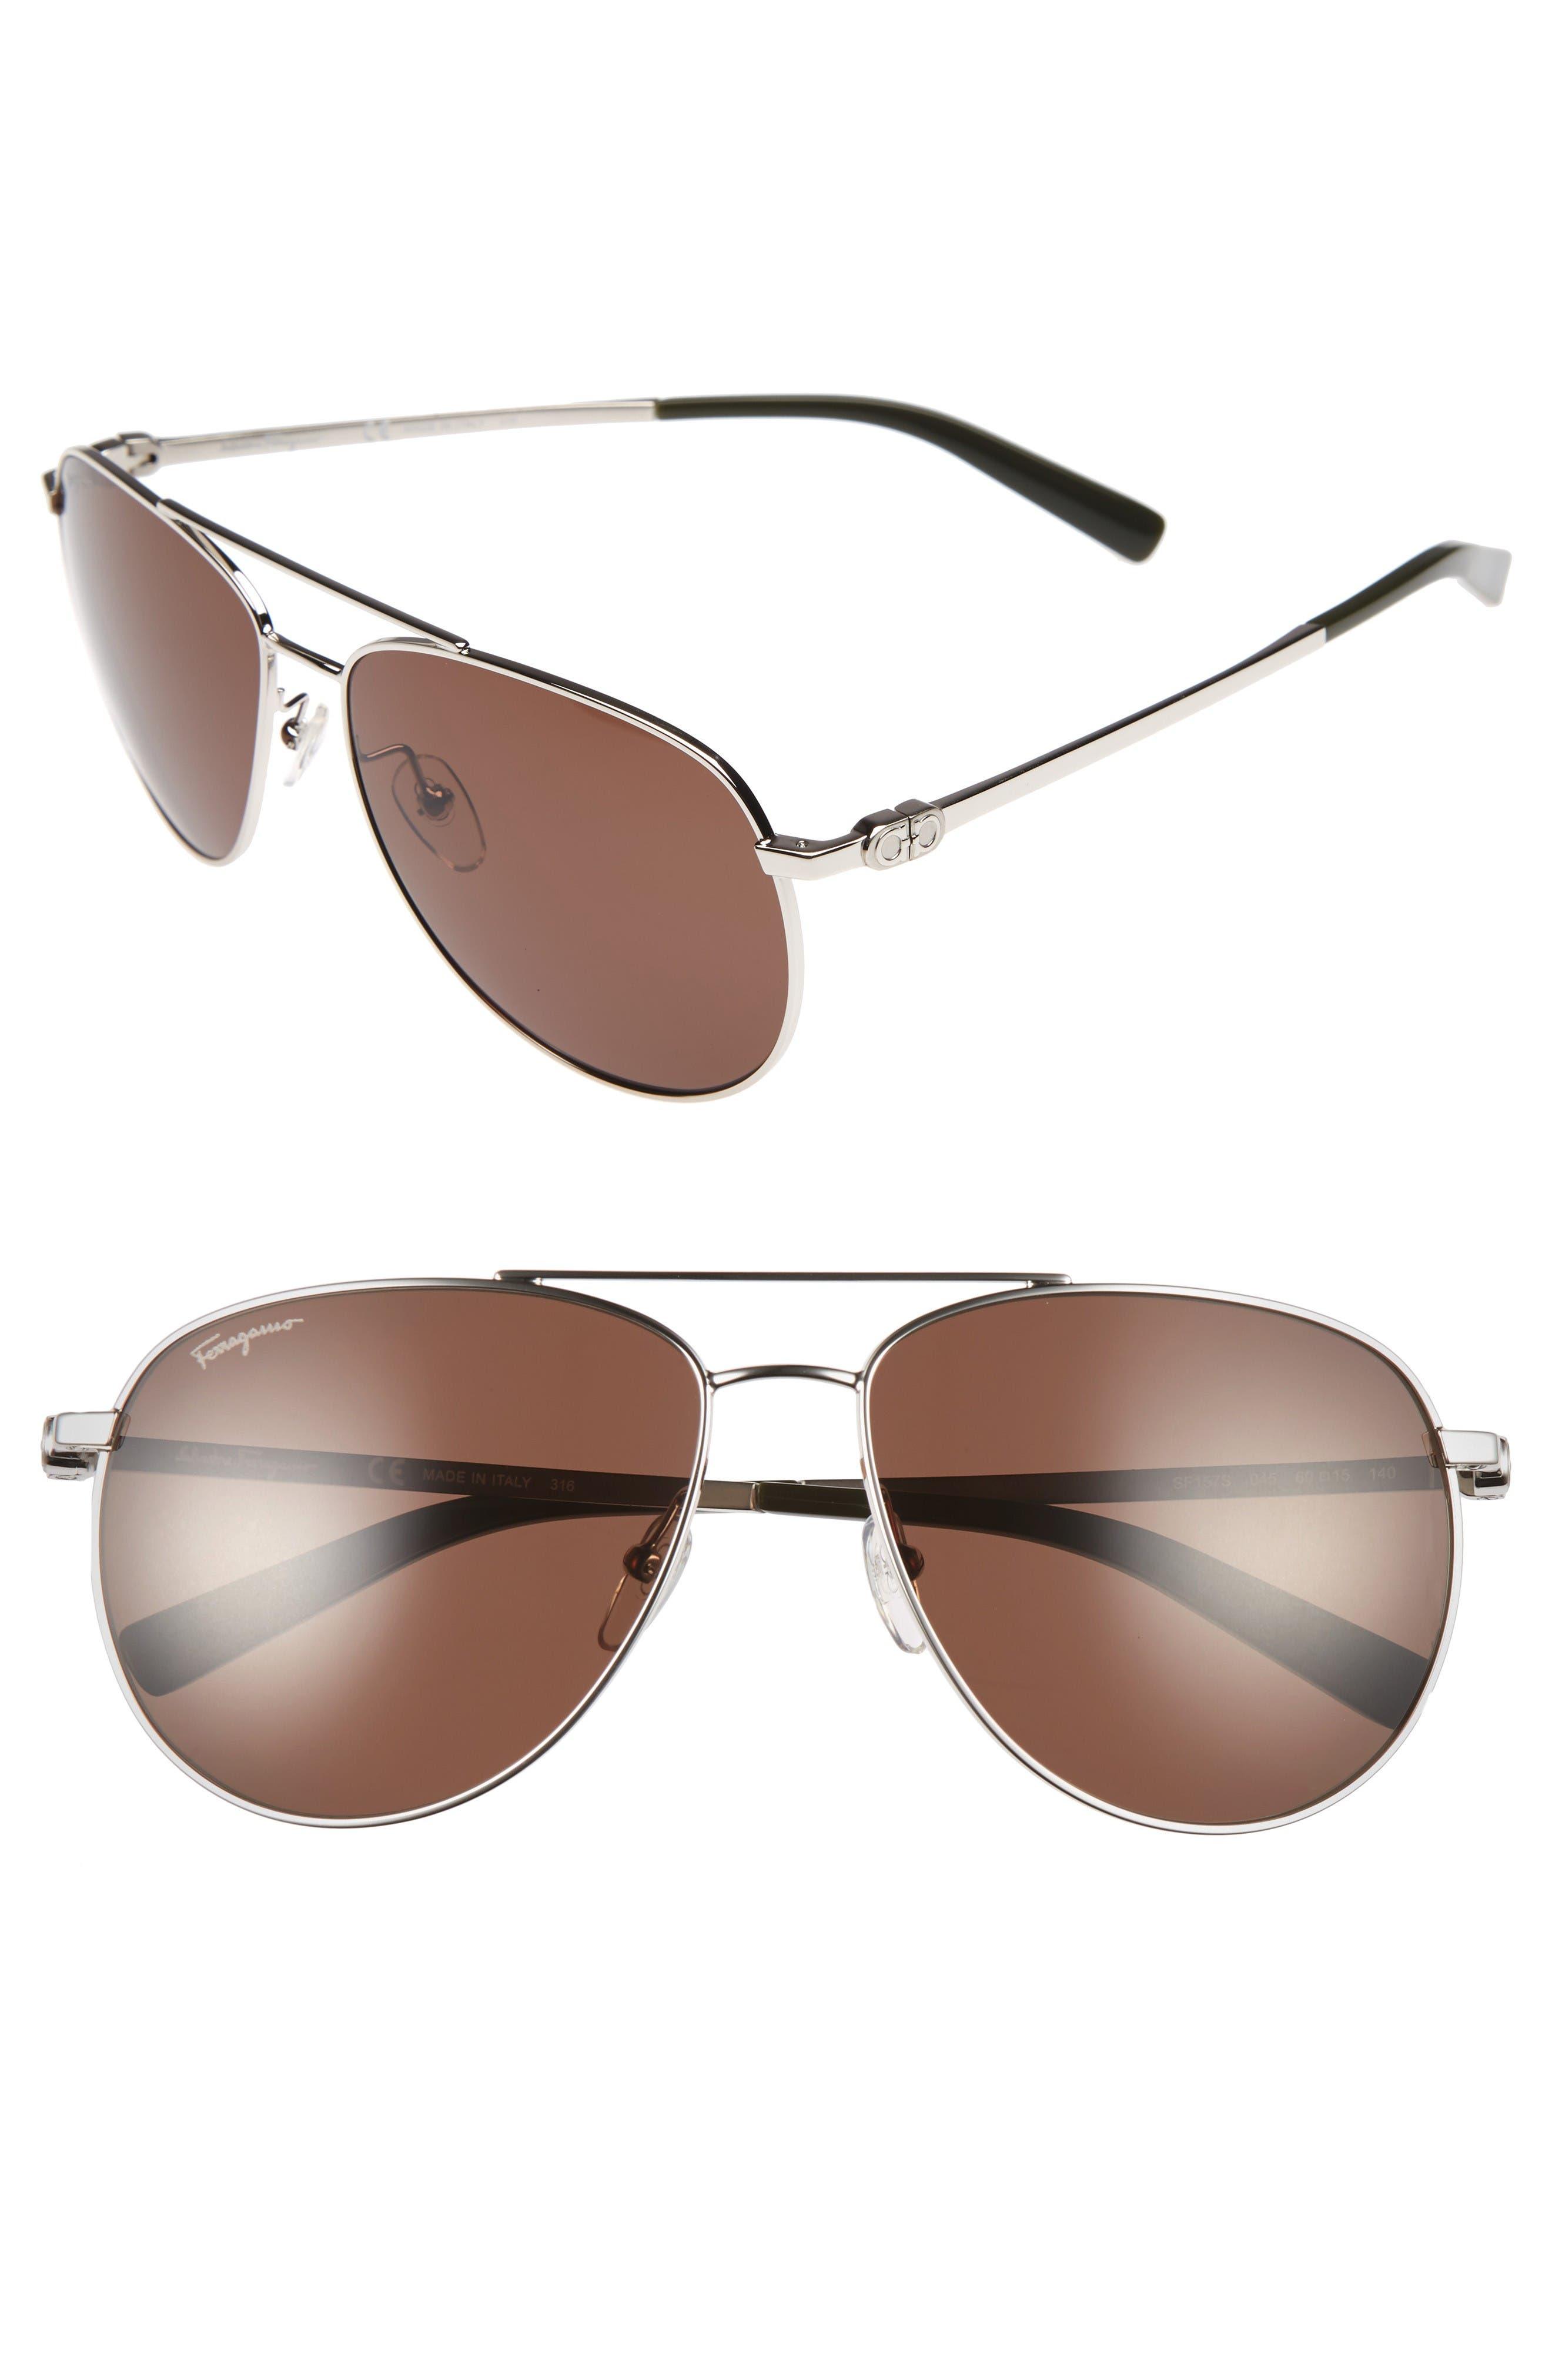 Main Image - Salvatore Ferragamo Gancio 60mm Aviator Sunglasses